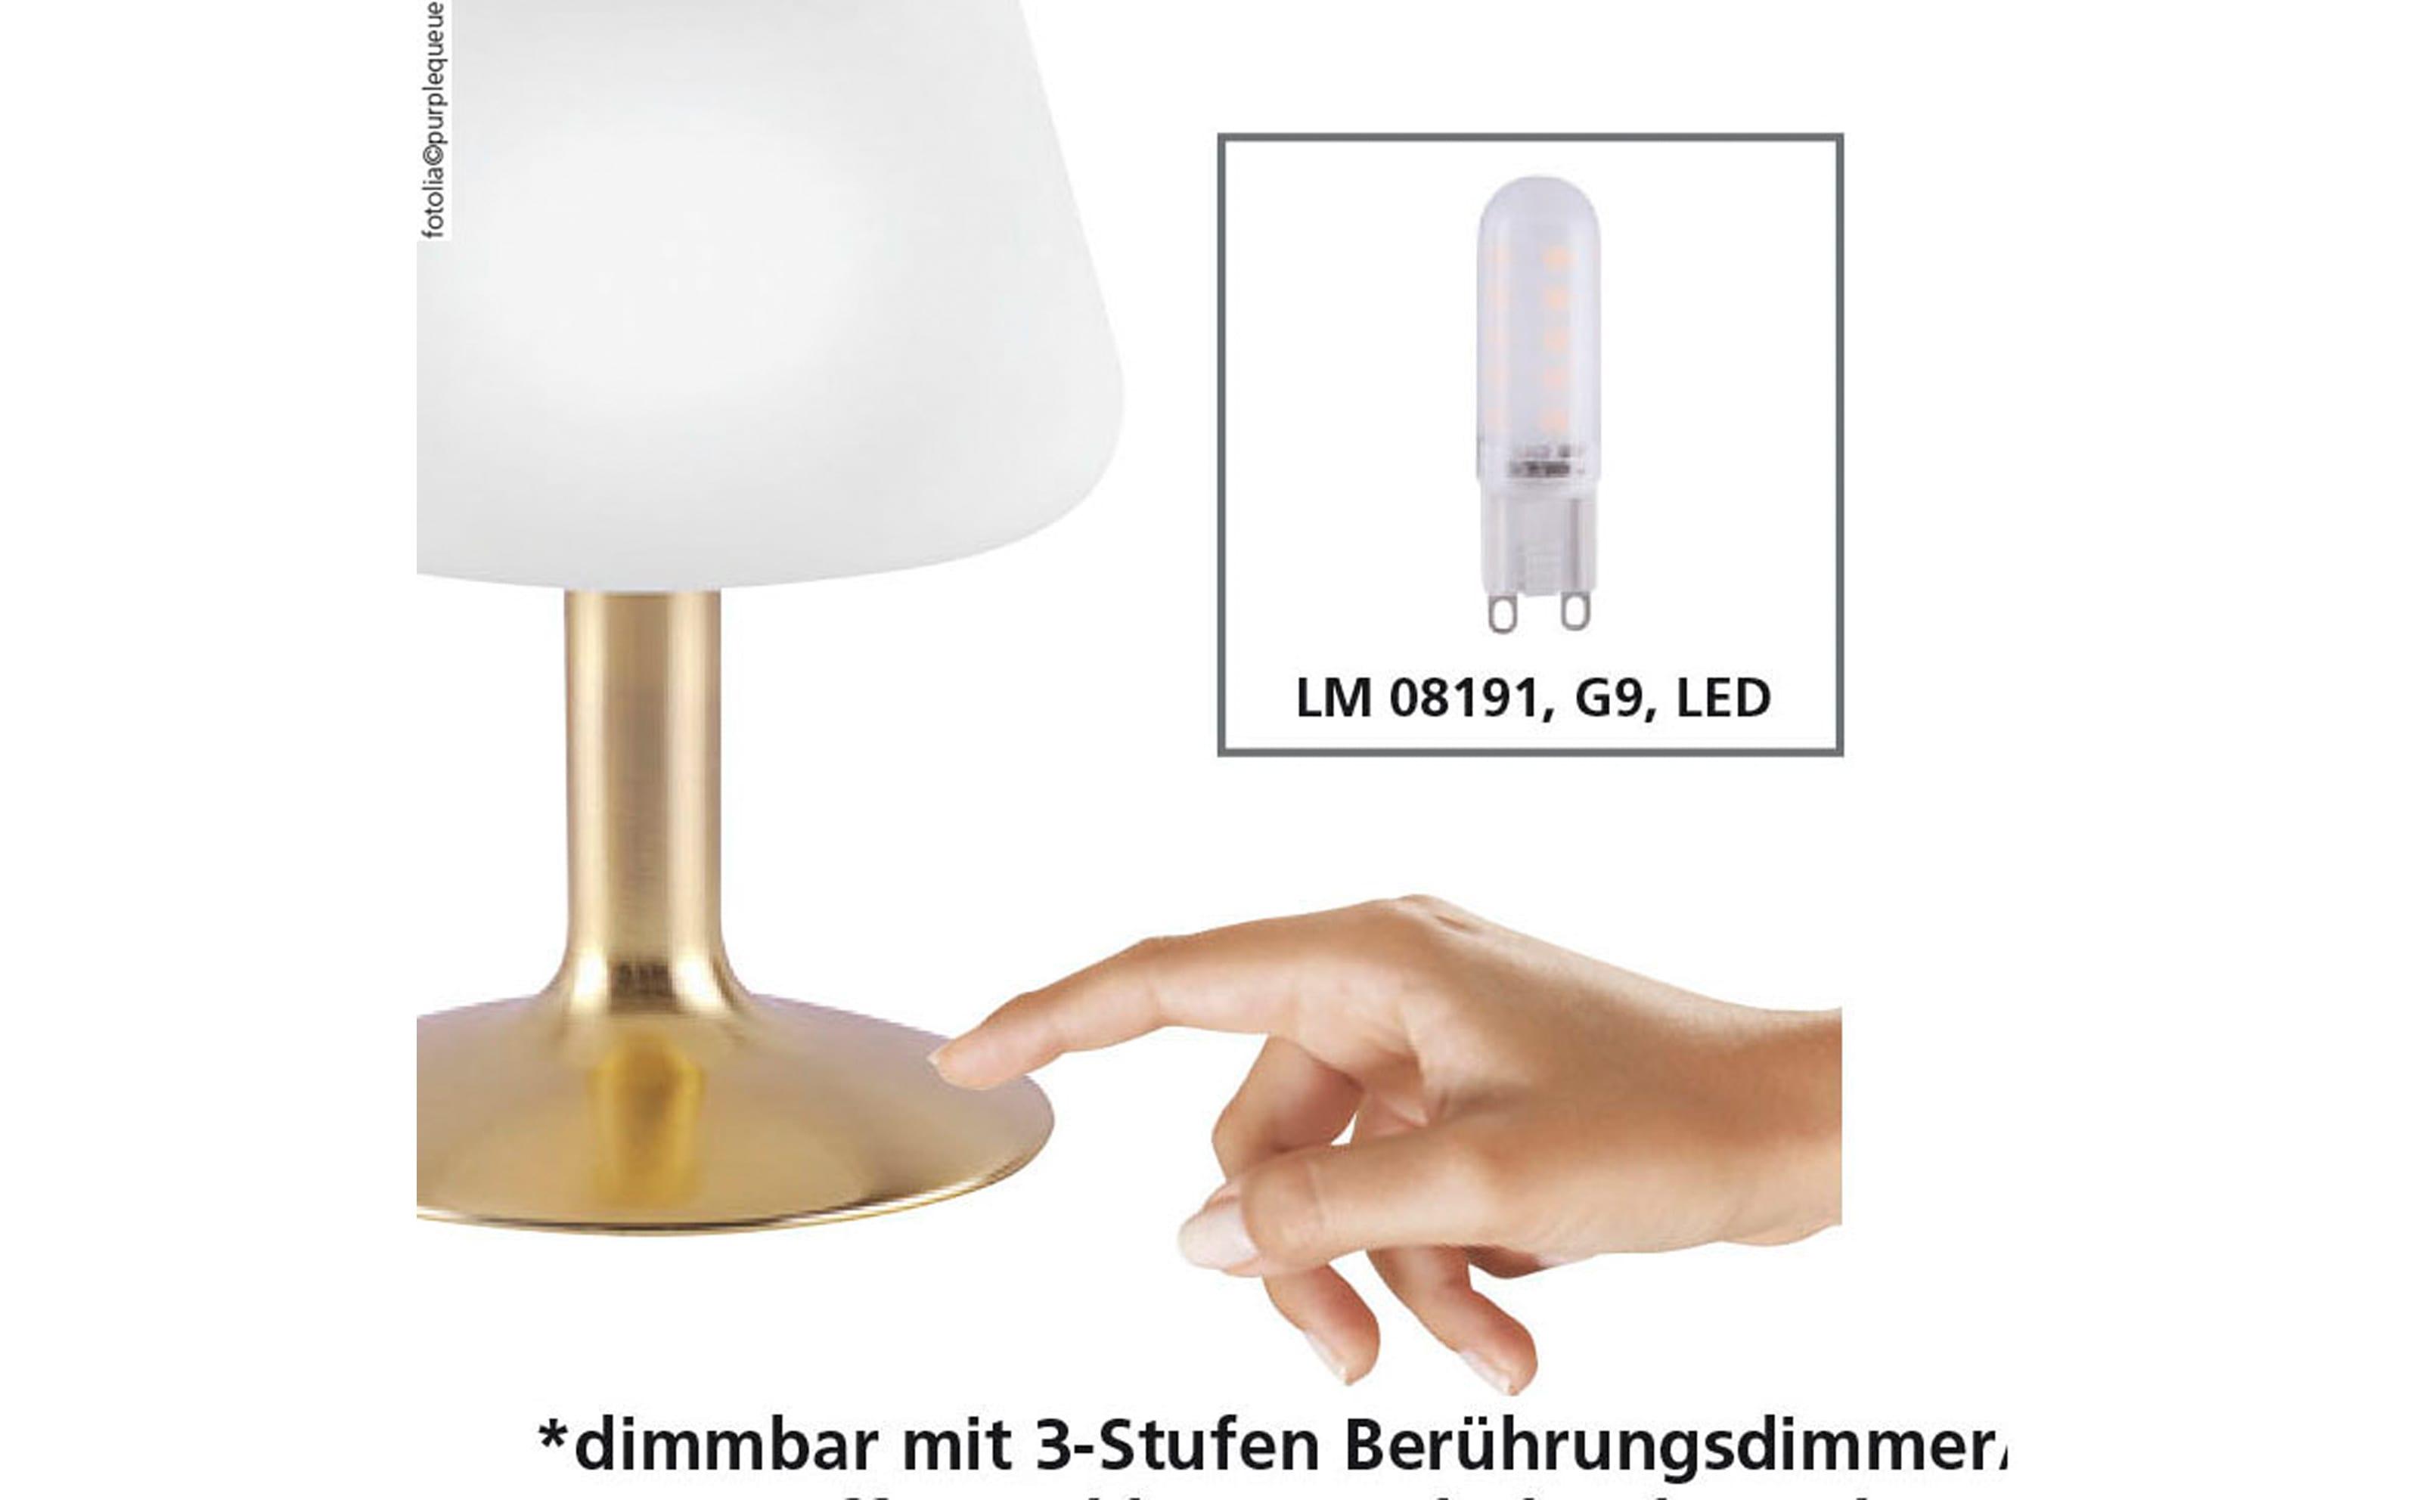 LED-Tischleuchte Till in stahlfarbig